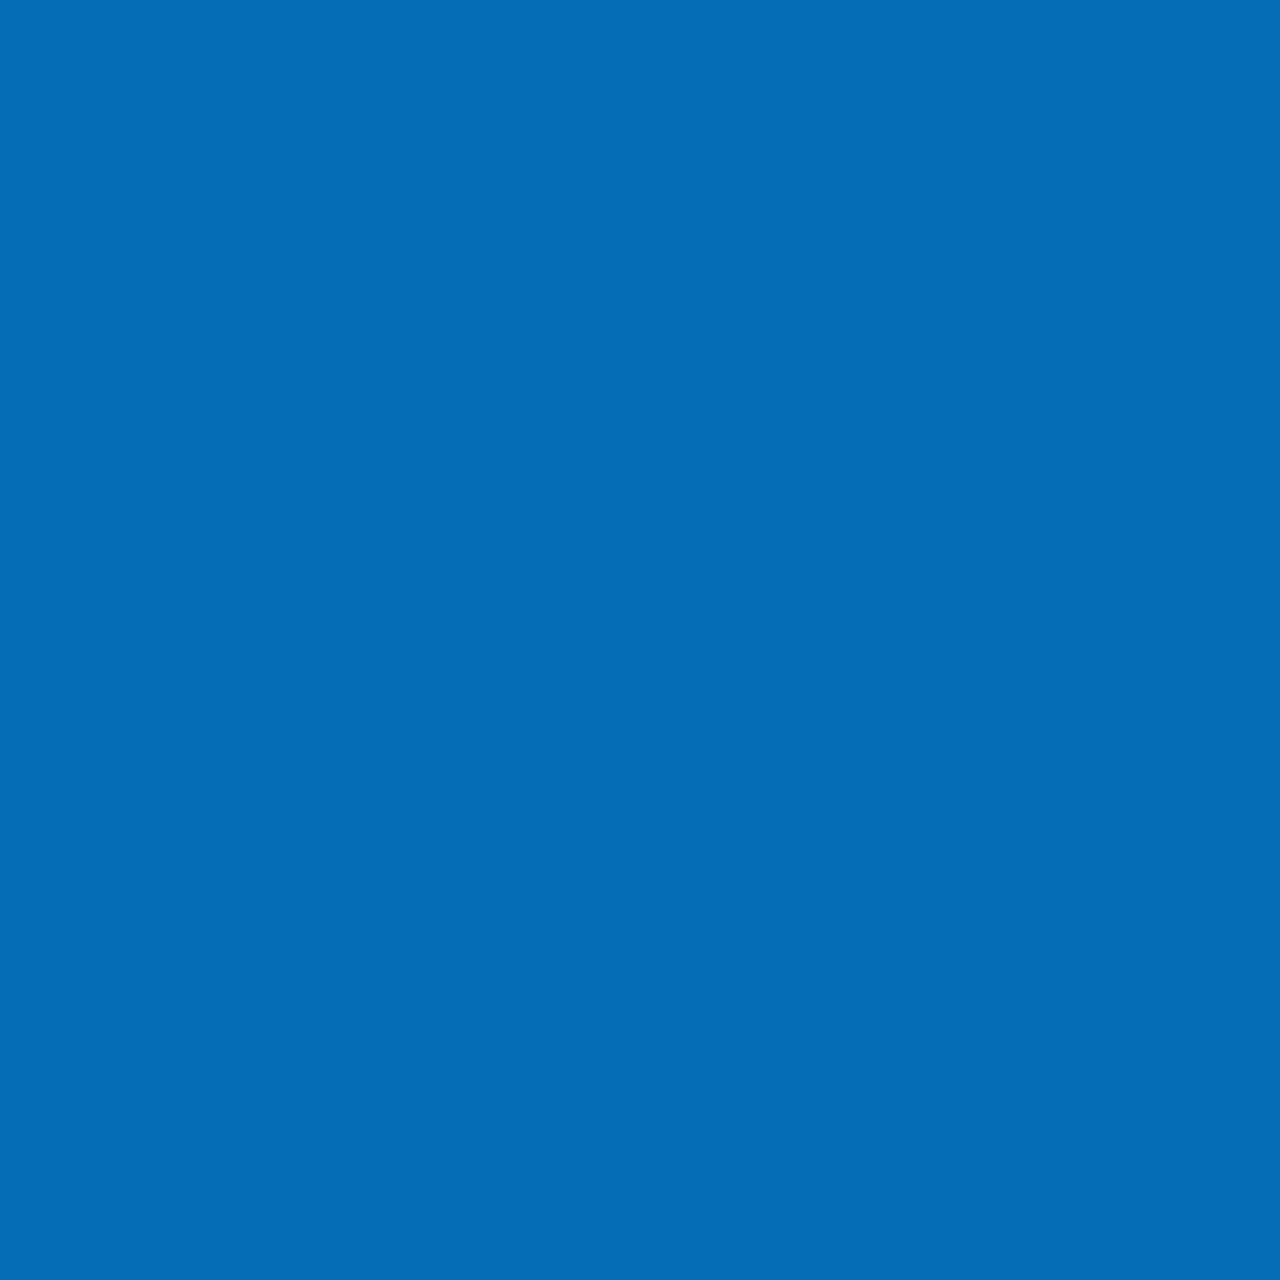 "#2007 Rosco Gels Roscolux Storaro Blue, 20x24"""